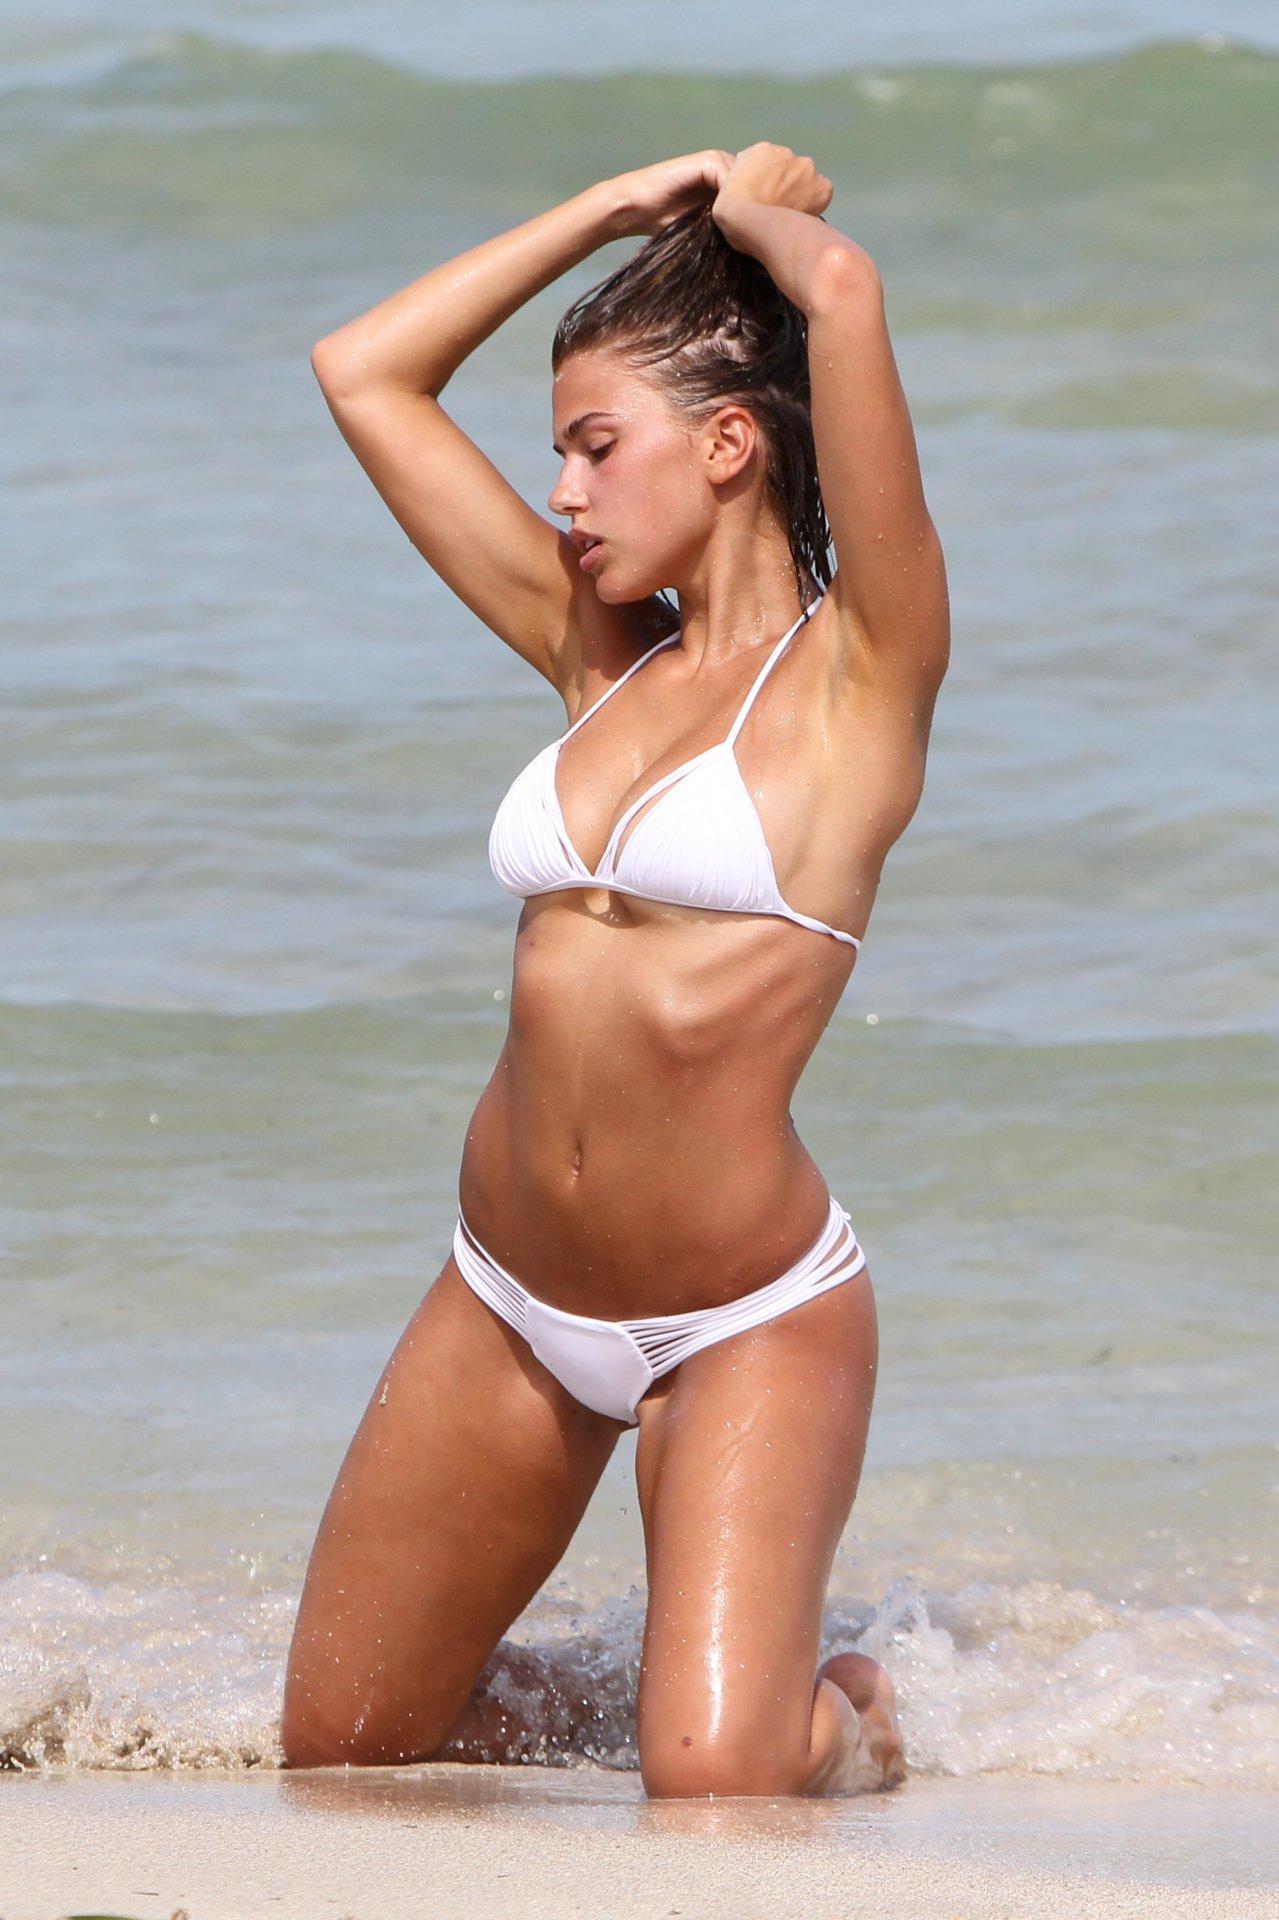 Kara Del Toro in Bikini Hot Photos  Pic 18 of 35